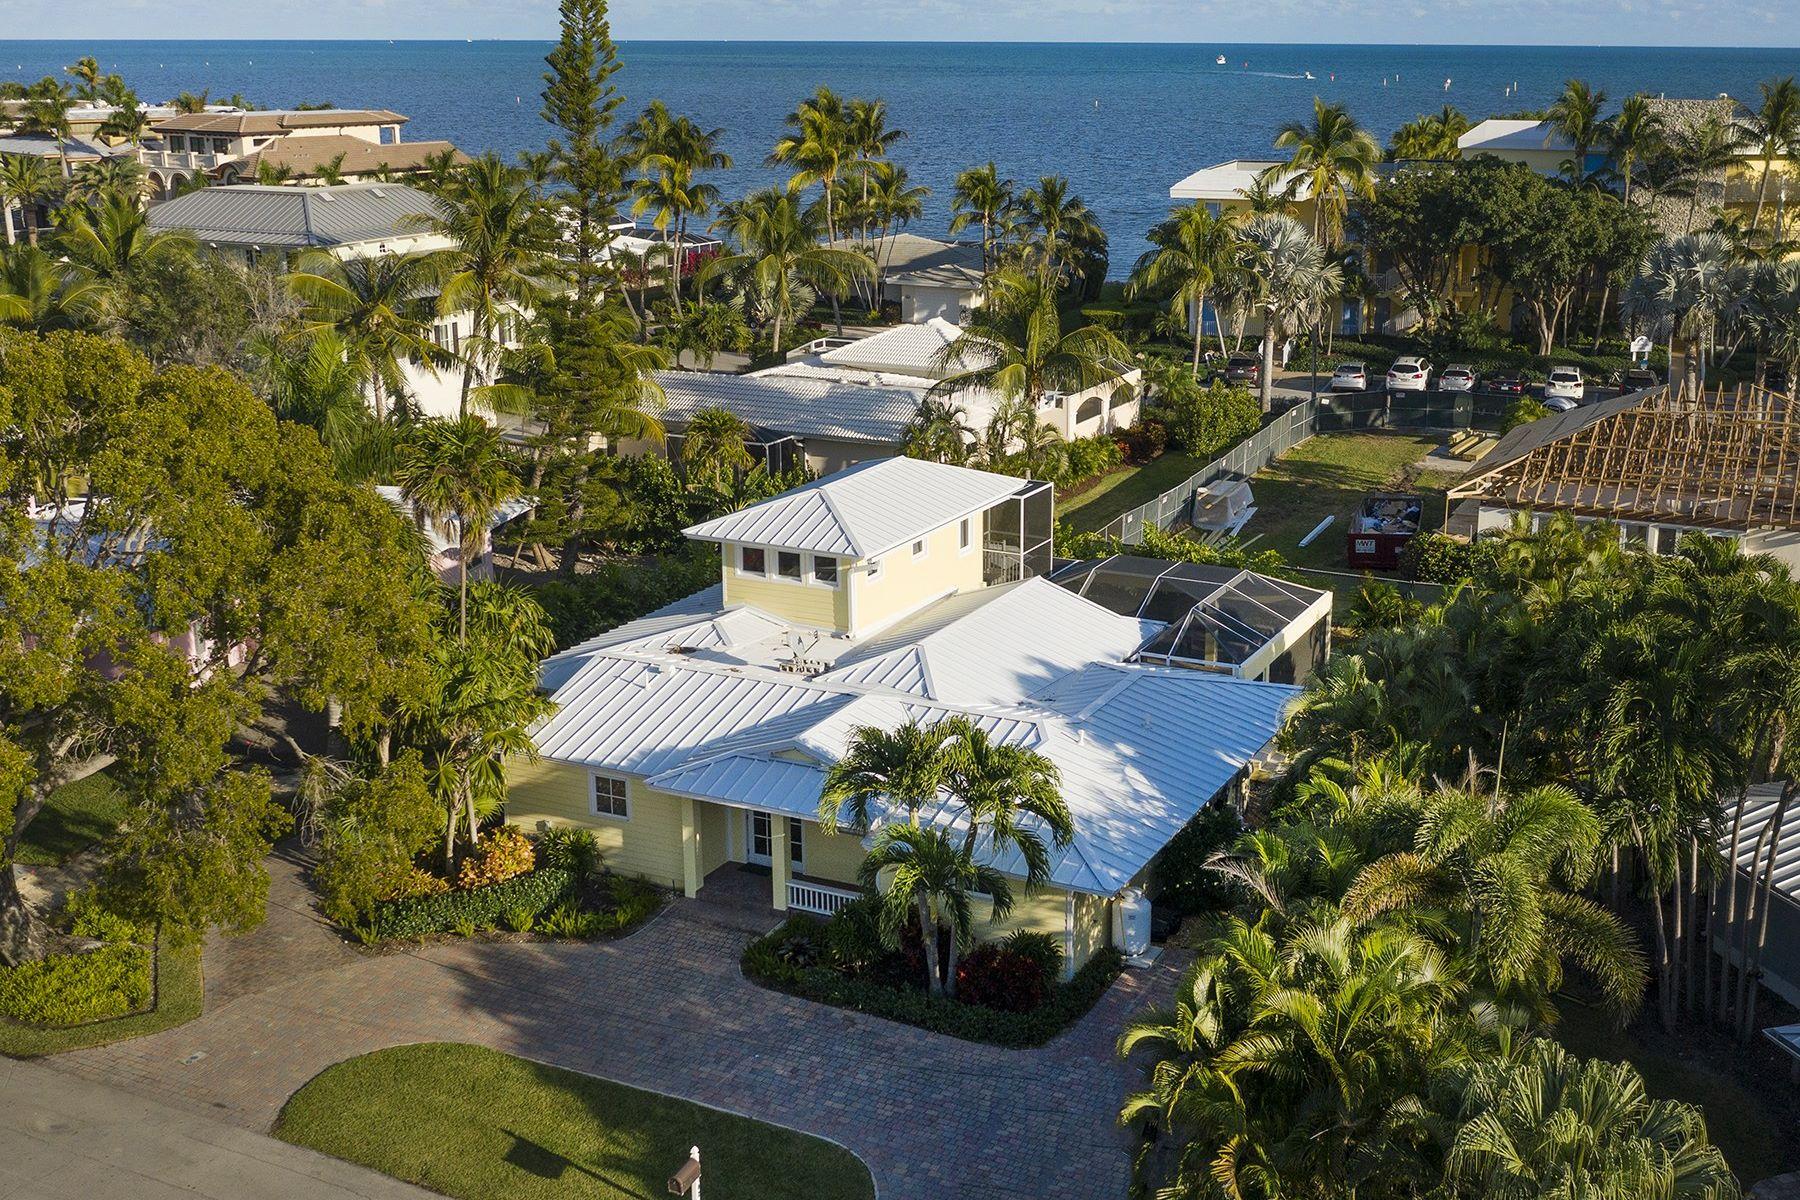 Single Family Homes 为 销售 在 302 Carysfort Road, Key Largo, FL 302 Carysfort Road 拉哥, 佛罗里达州 33037 美国